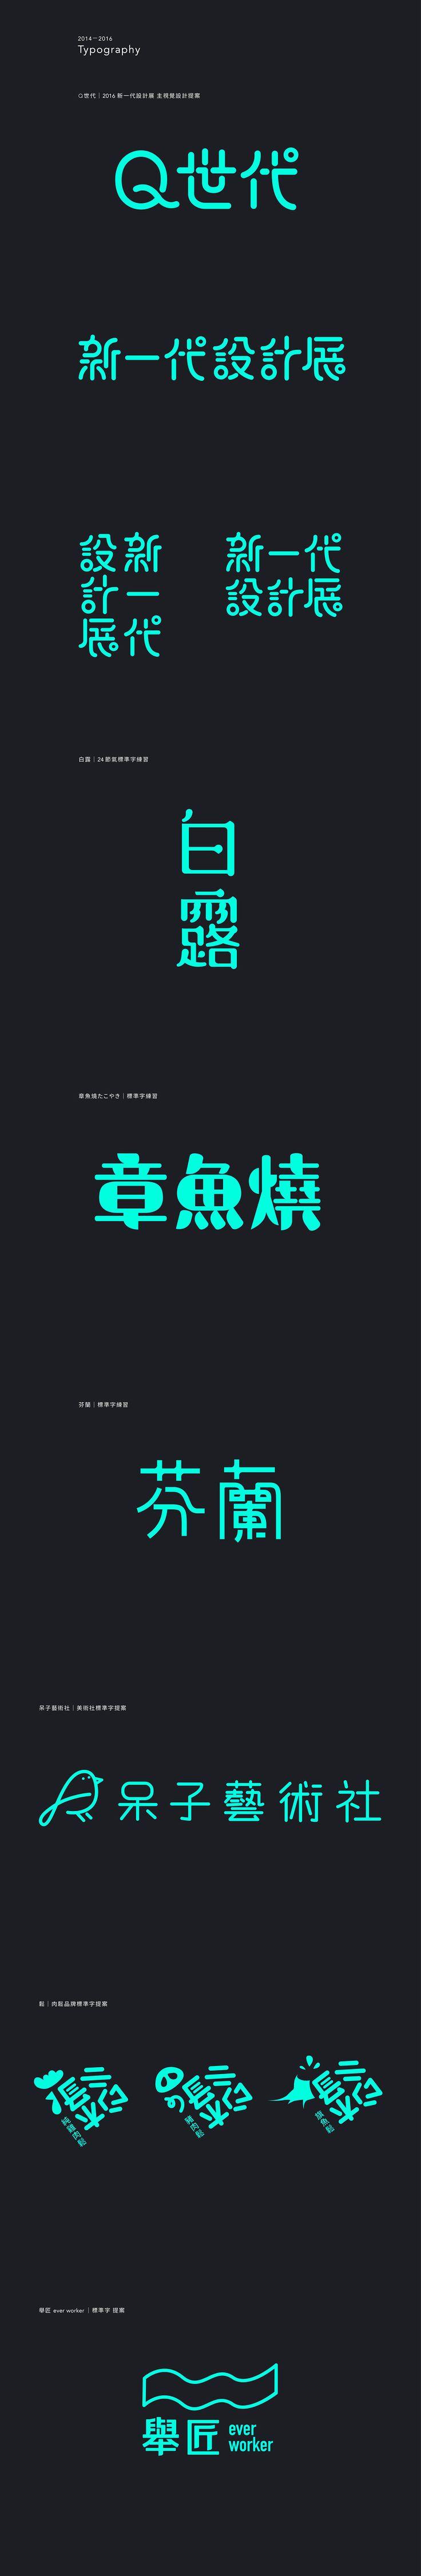 Logotype 2014-2016 on Behance